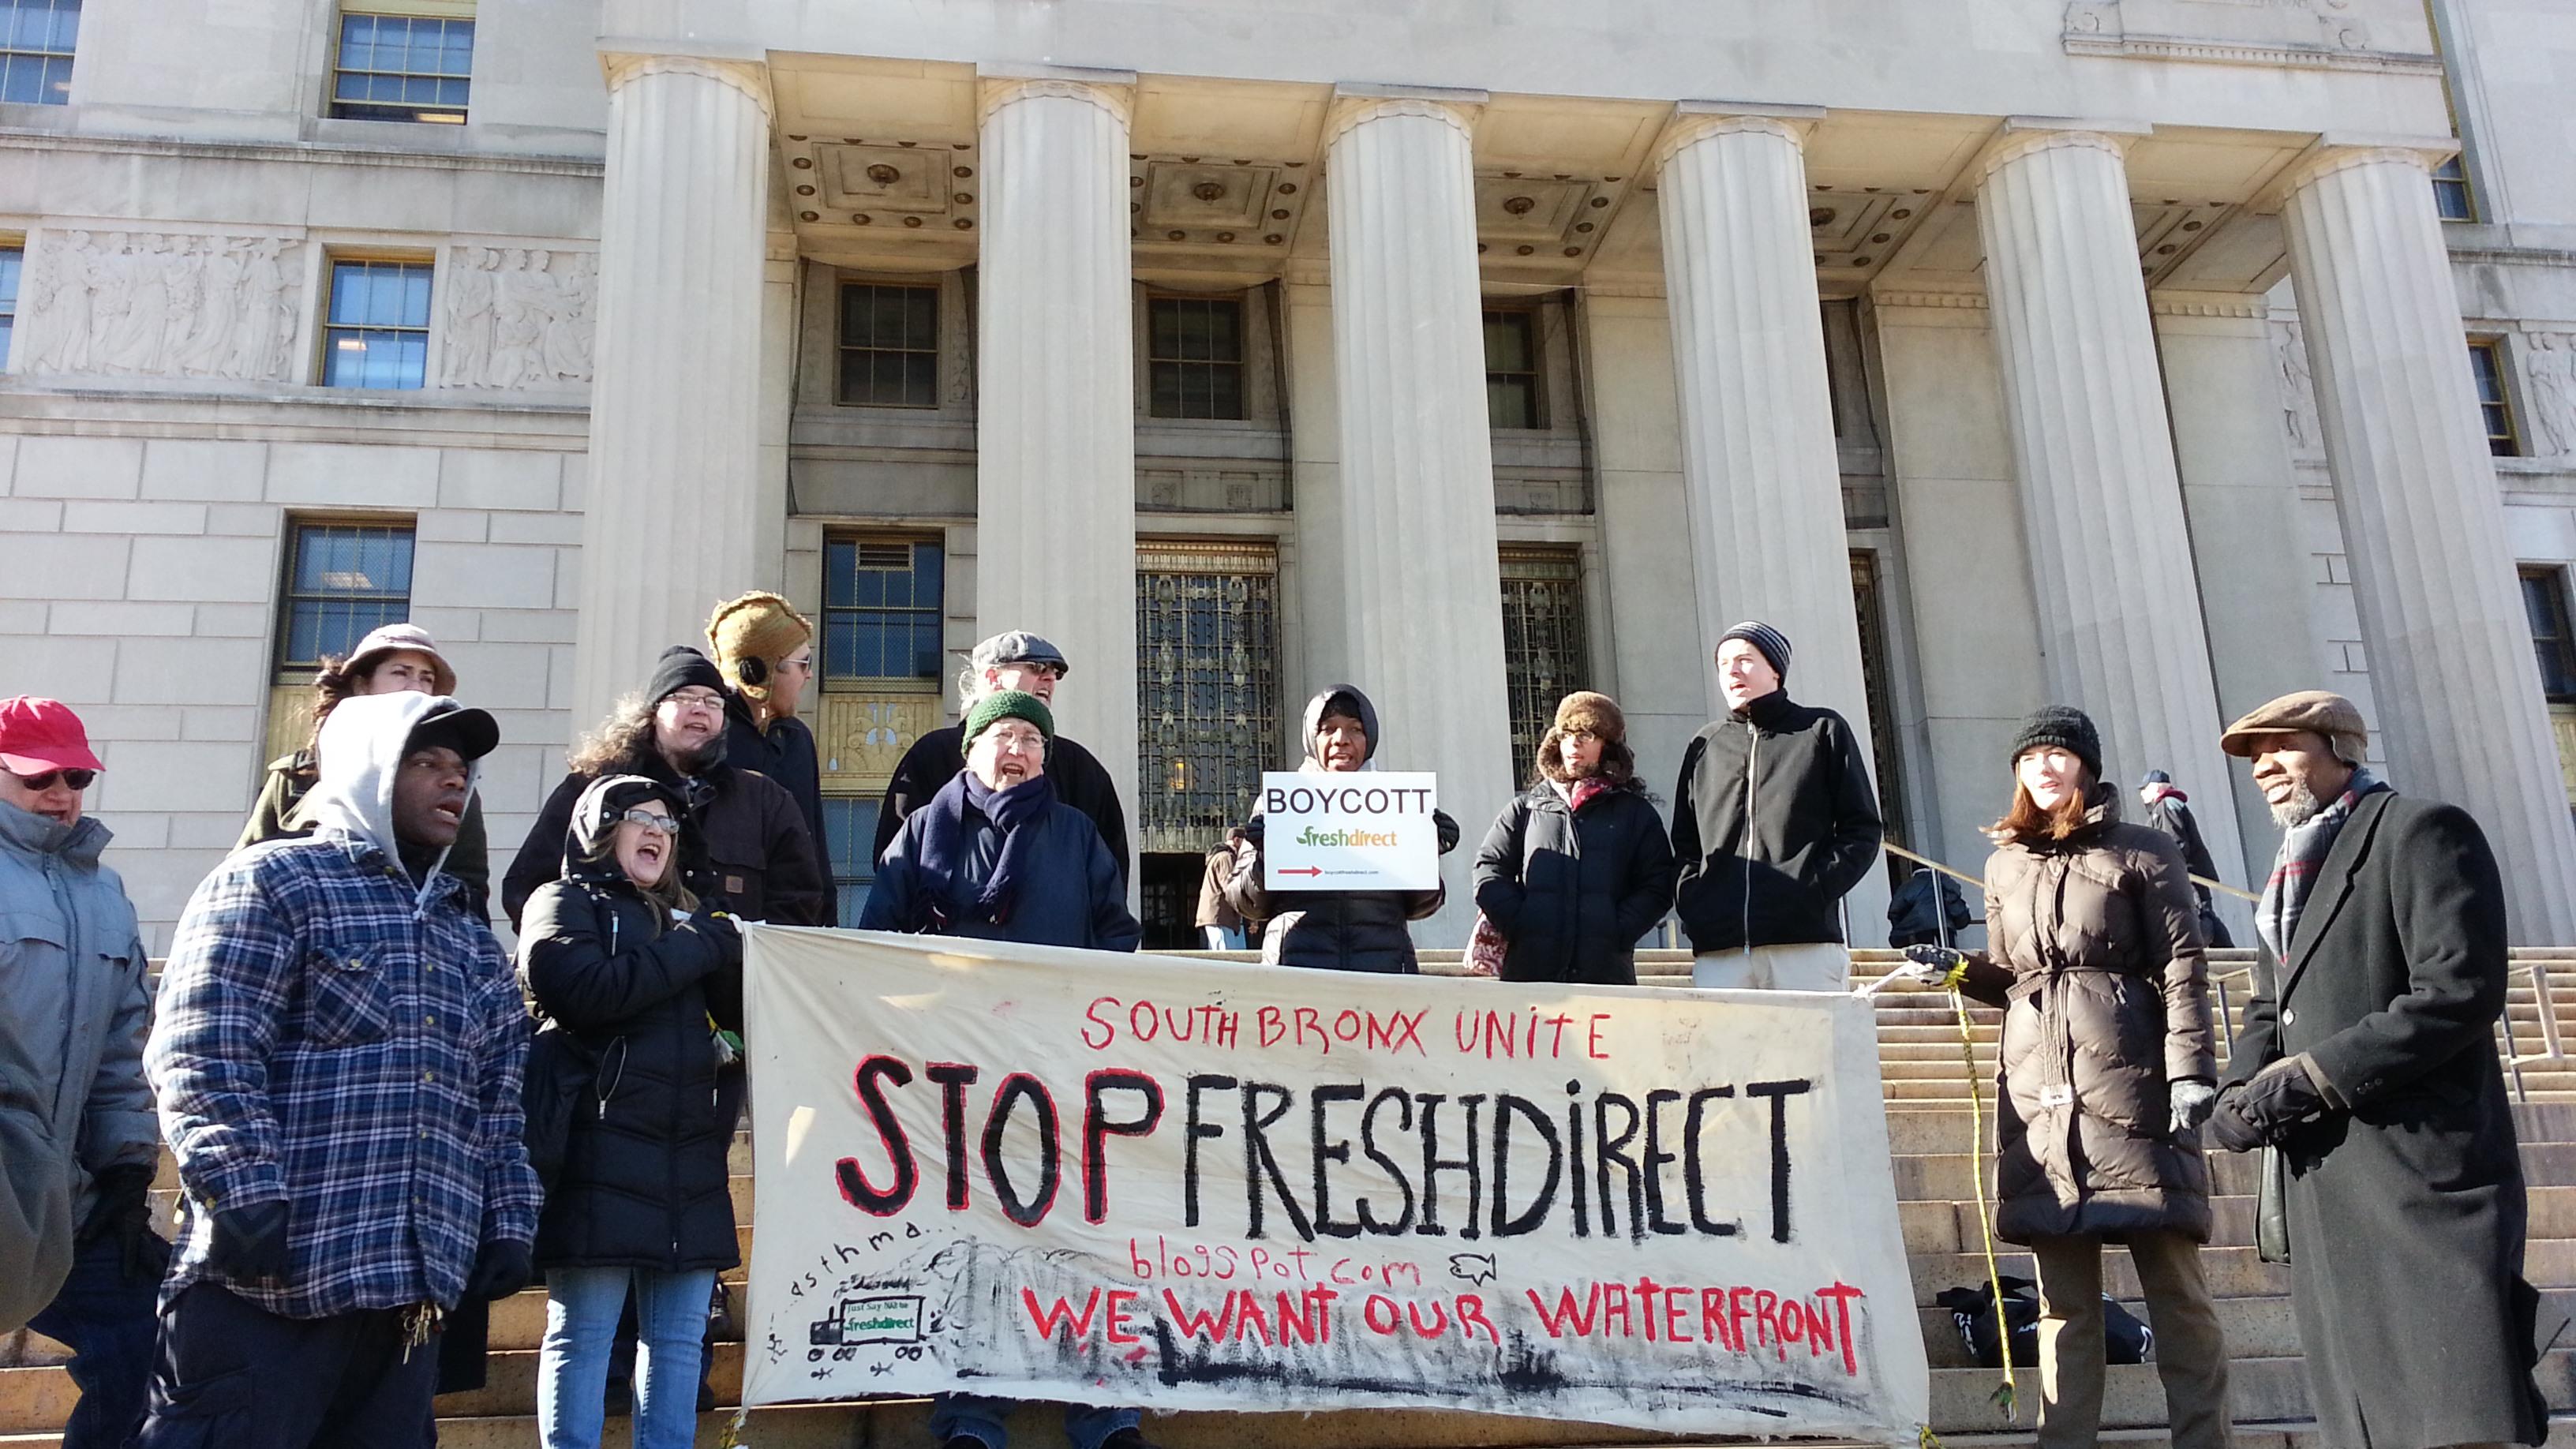 Court hears case against FreshDirect